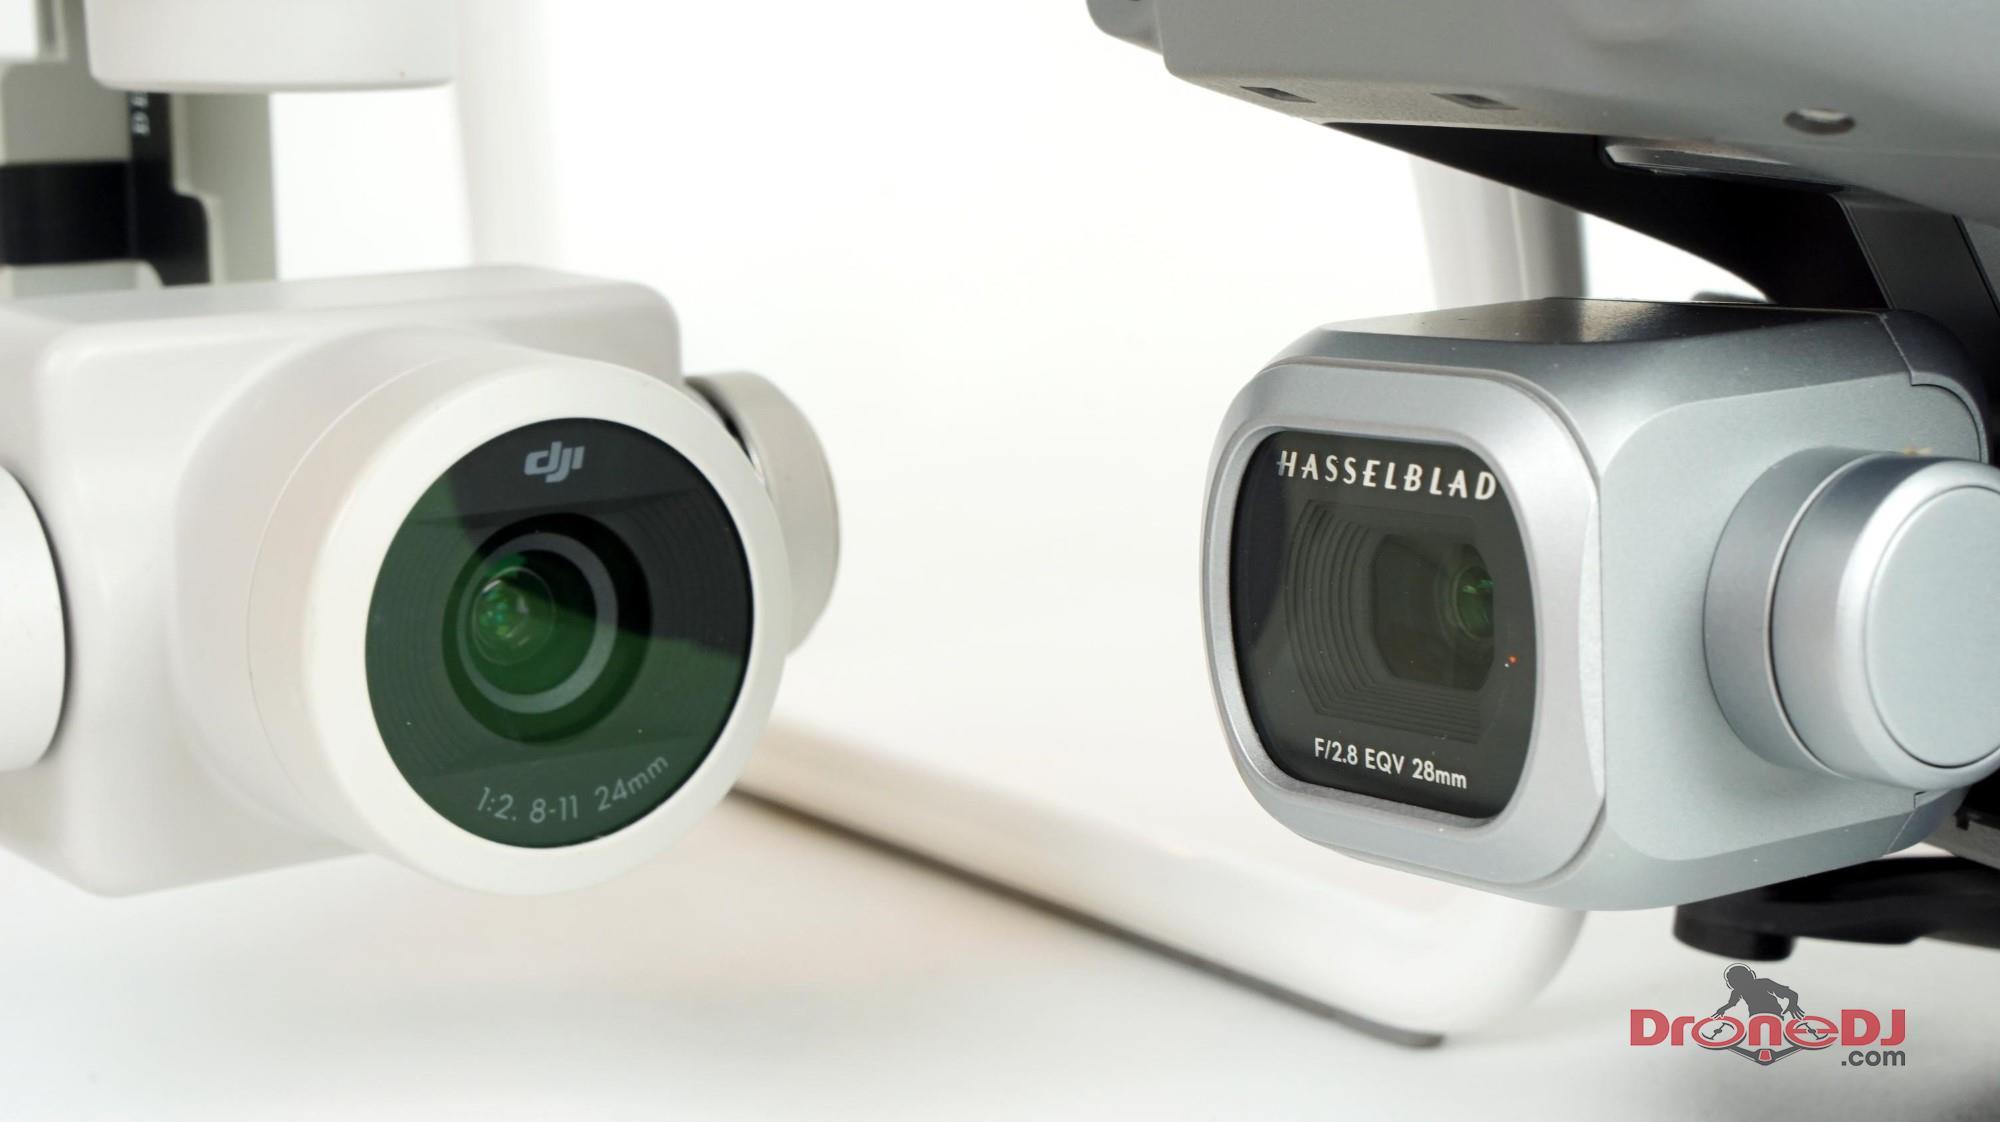 Phantom 4 Pro and Mavic 2 Pro Cameras